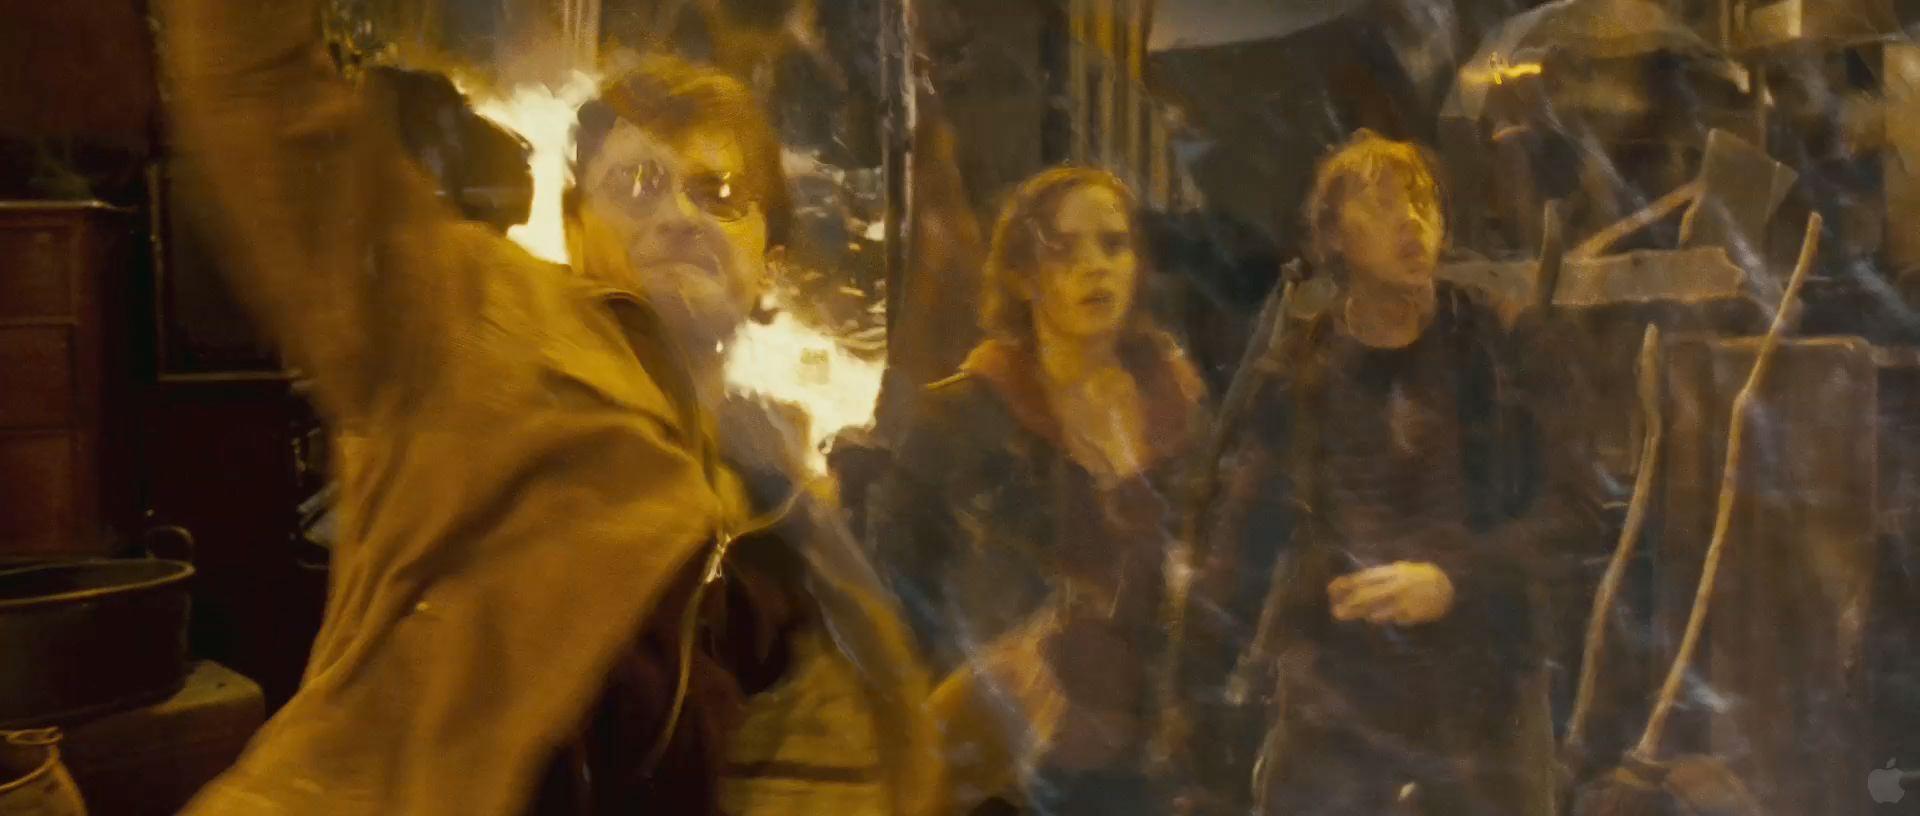 Harry Potter BlogHogwarts HP7 2 Trailer 70